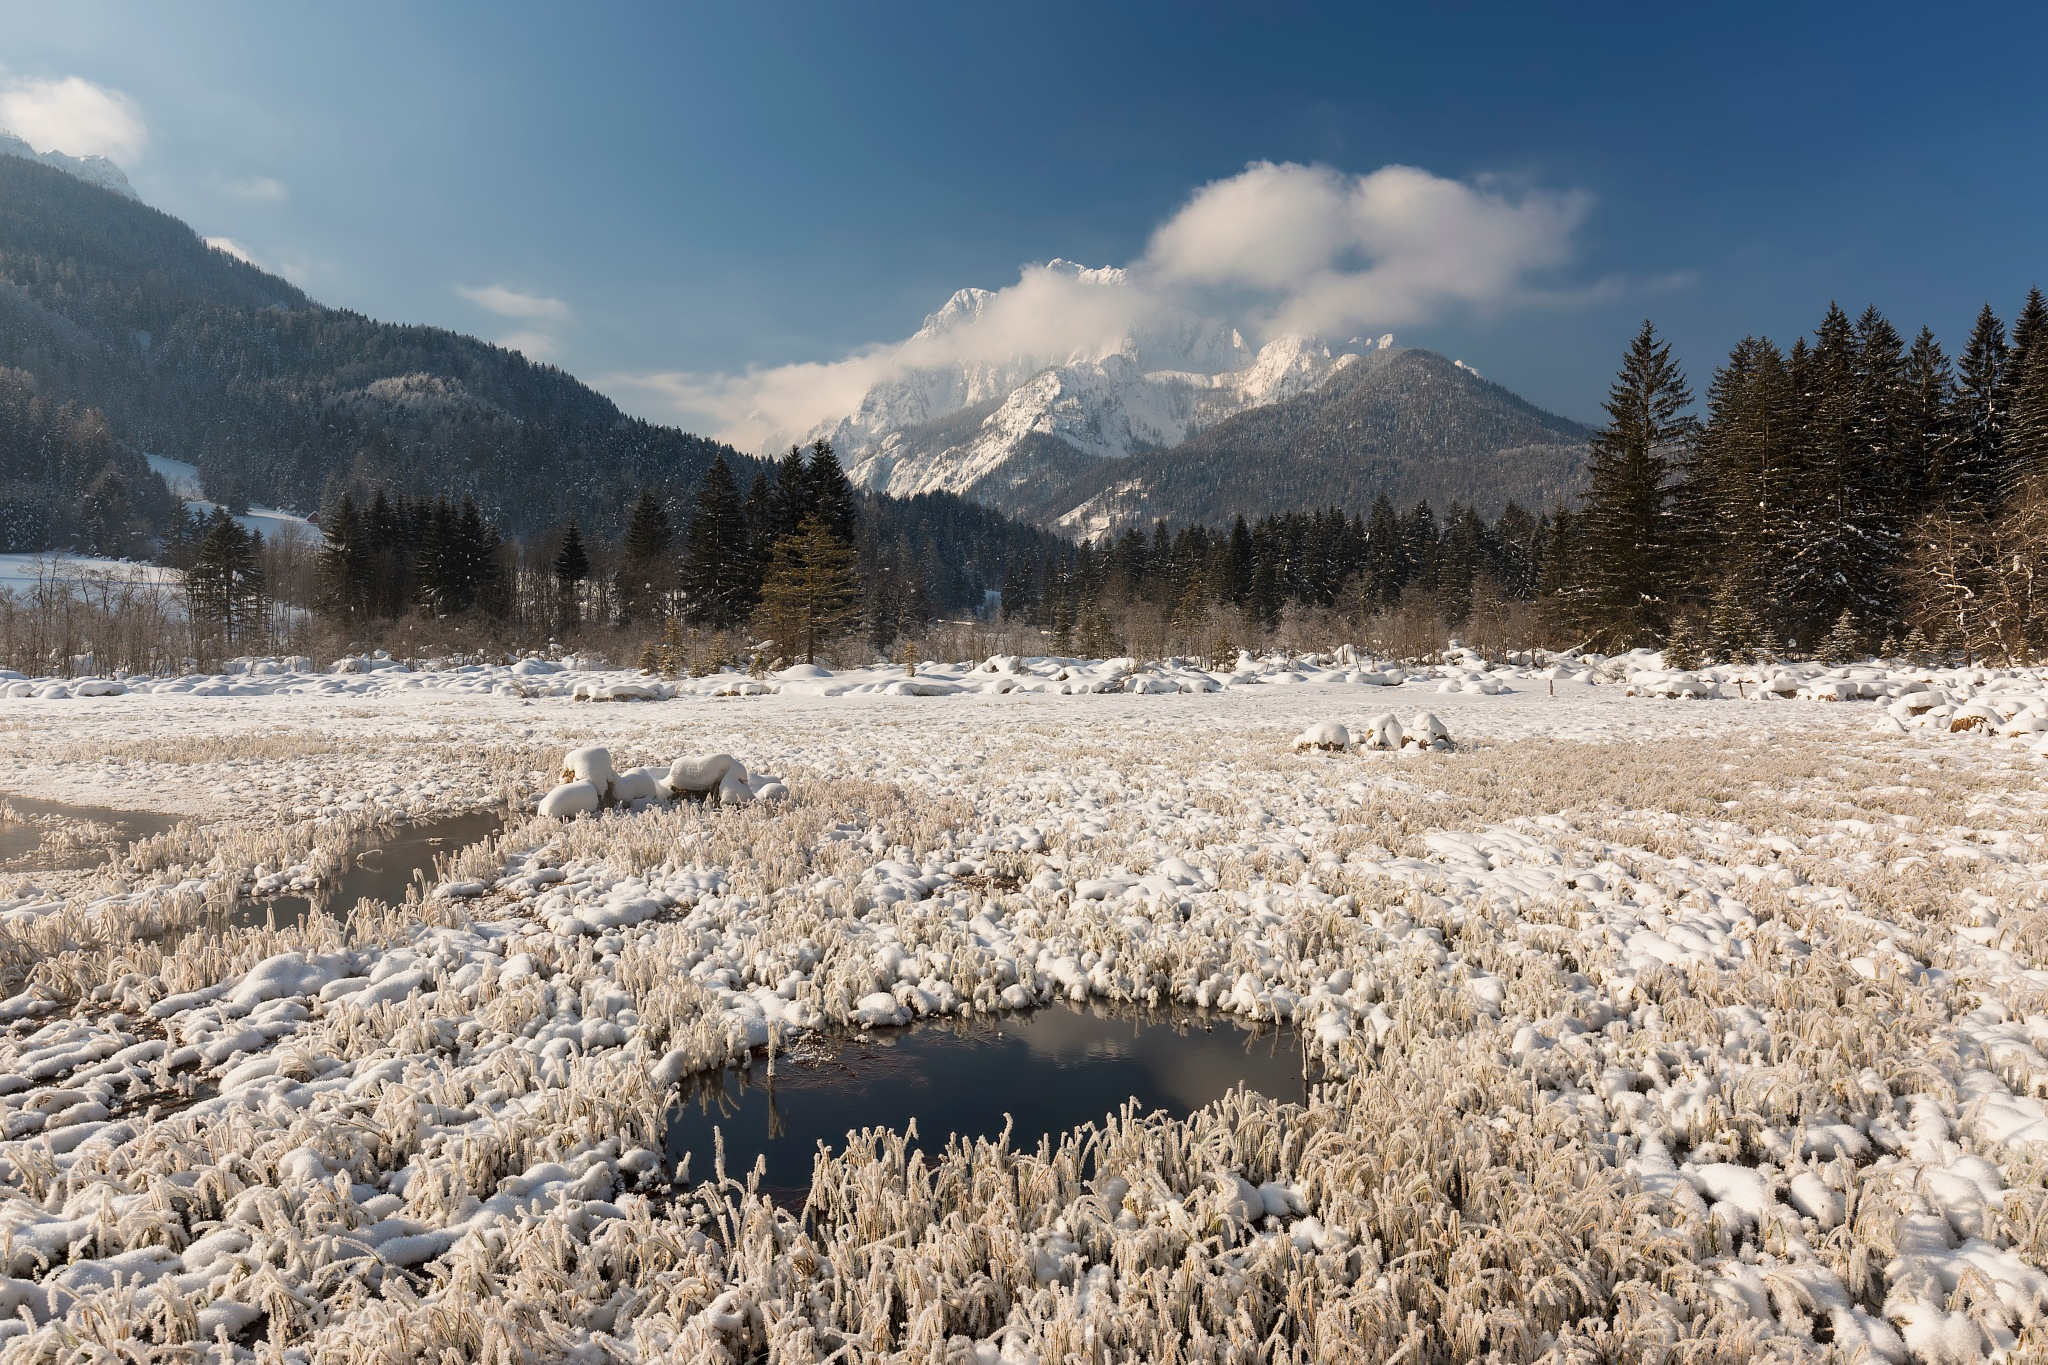 Byebye winter by Bor Rojnik